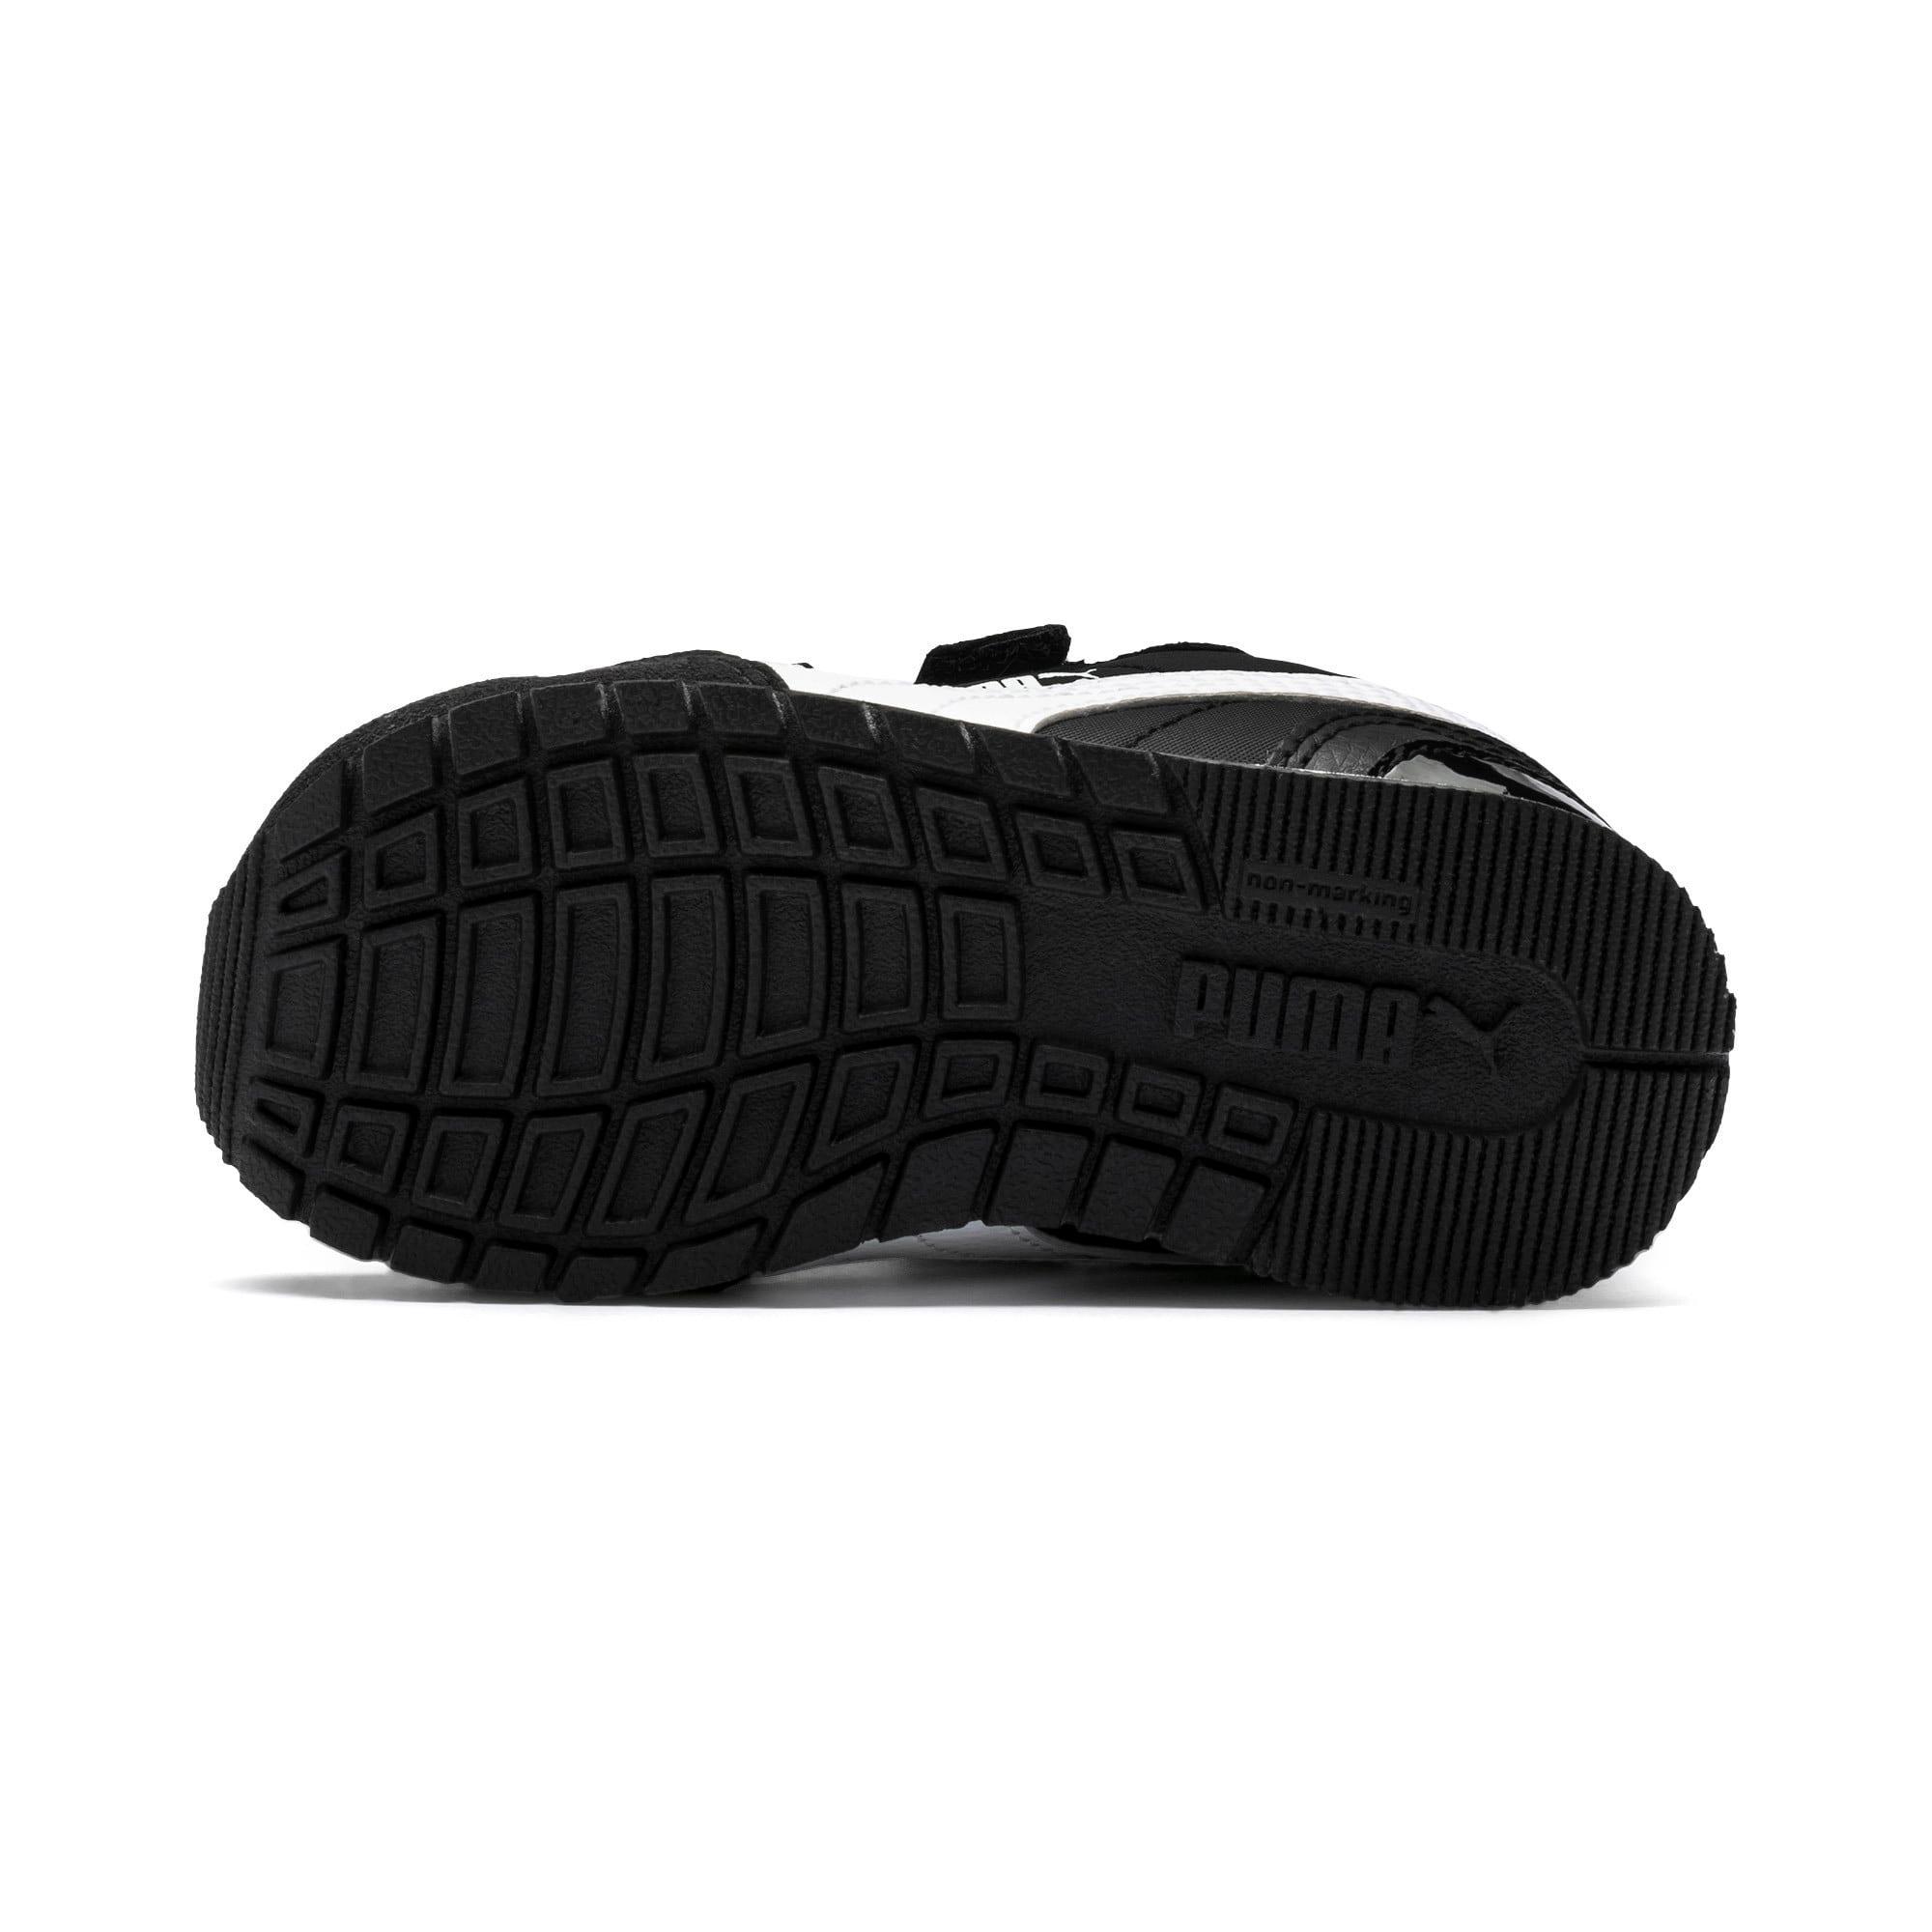 Thumbnail 4 of ST Runner V2 V Toddler Shoes, Puma Black-Puma White, medium